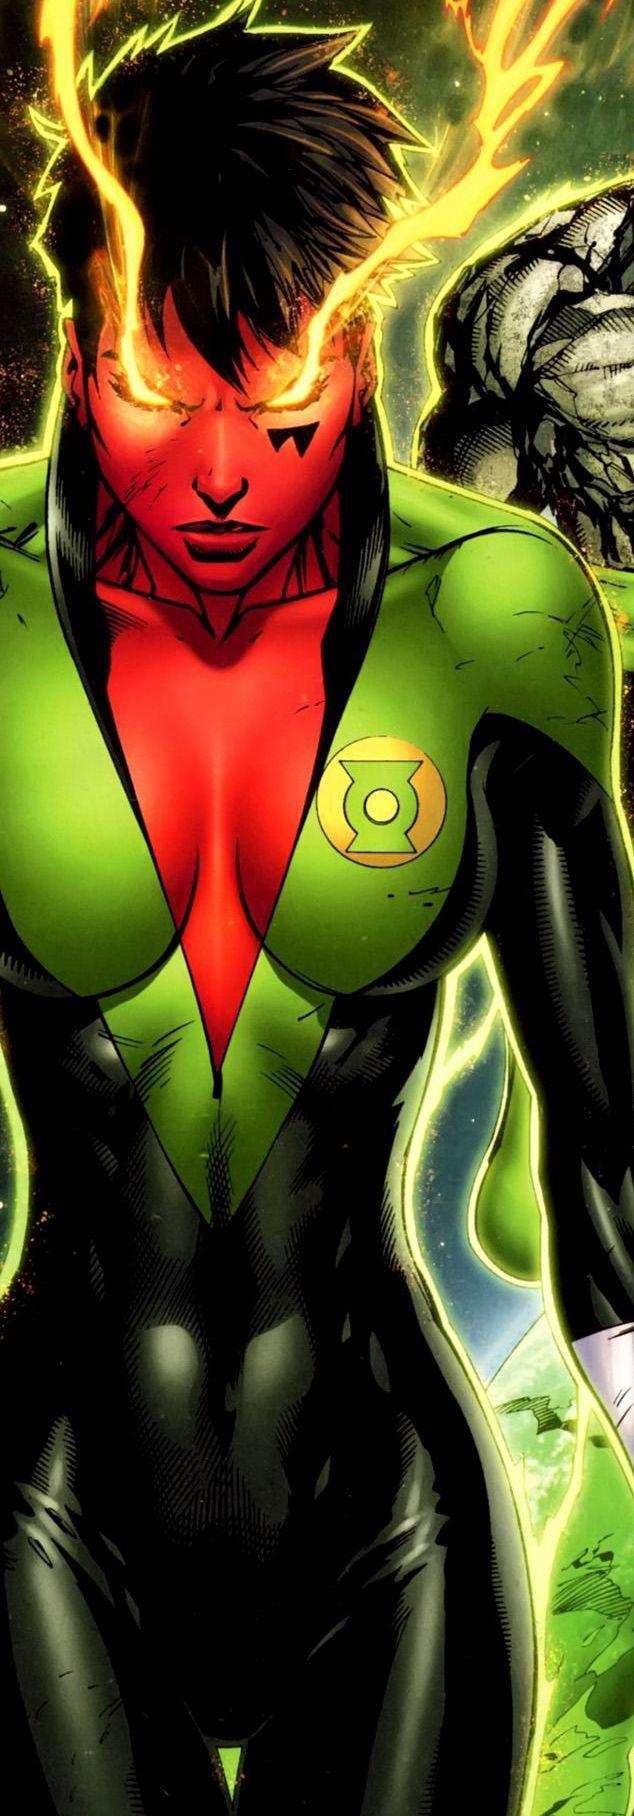 Soranik Natu In Green Lantern Corps Vol 2 #58  Art By Tyler Kirkham,